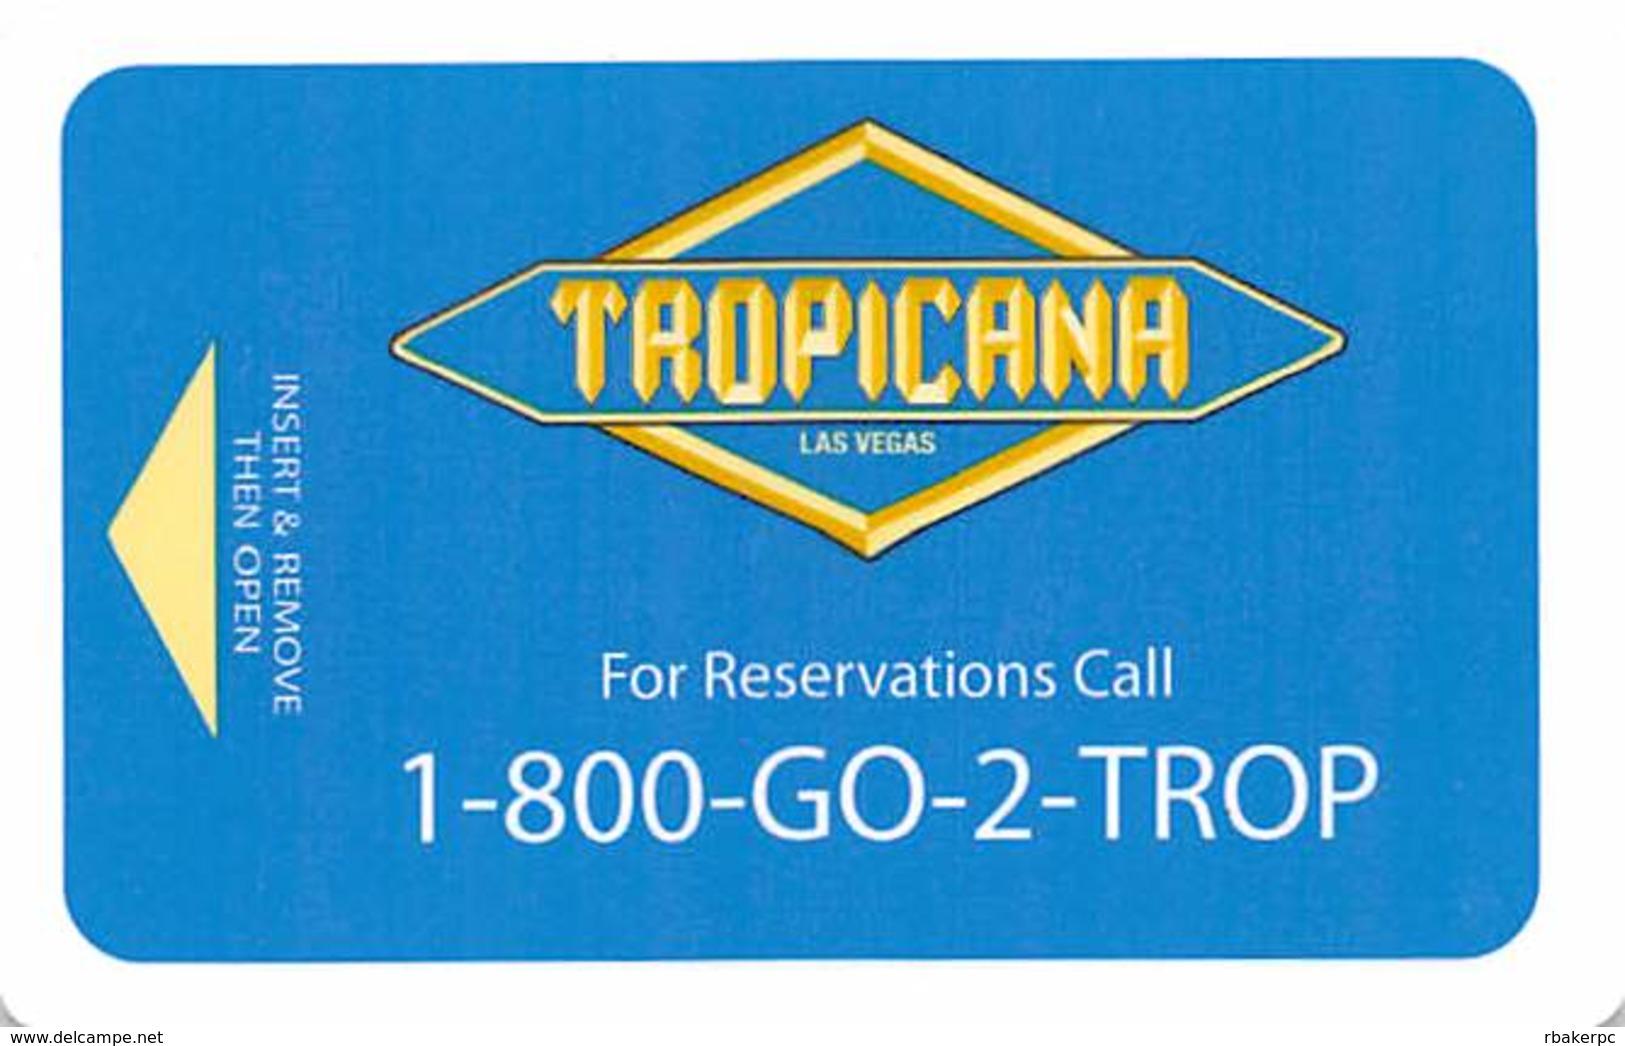 Tropicana Casino Las Vegas Hotel Room Key Card - Hotel Keycards